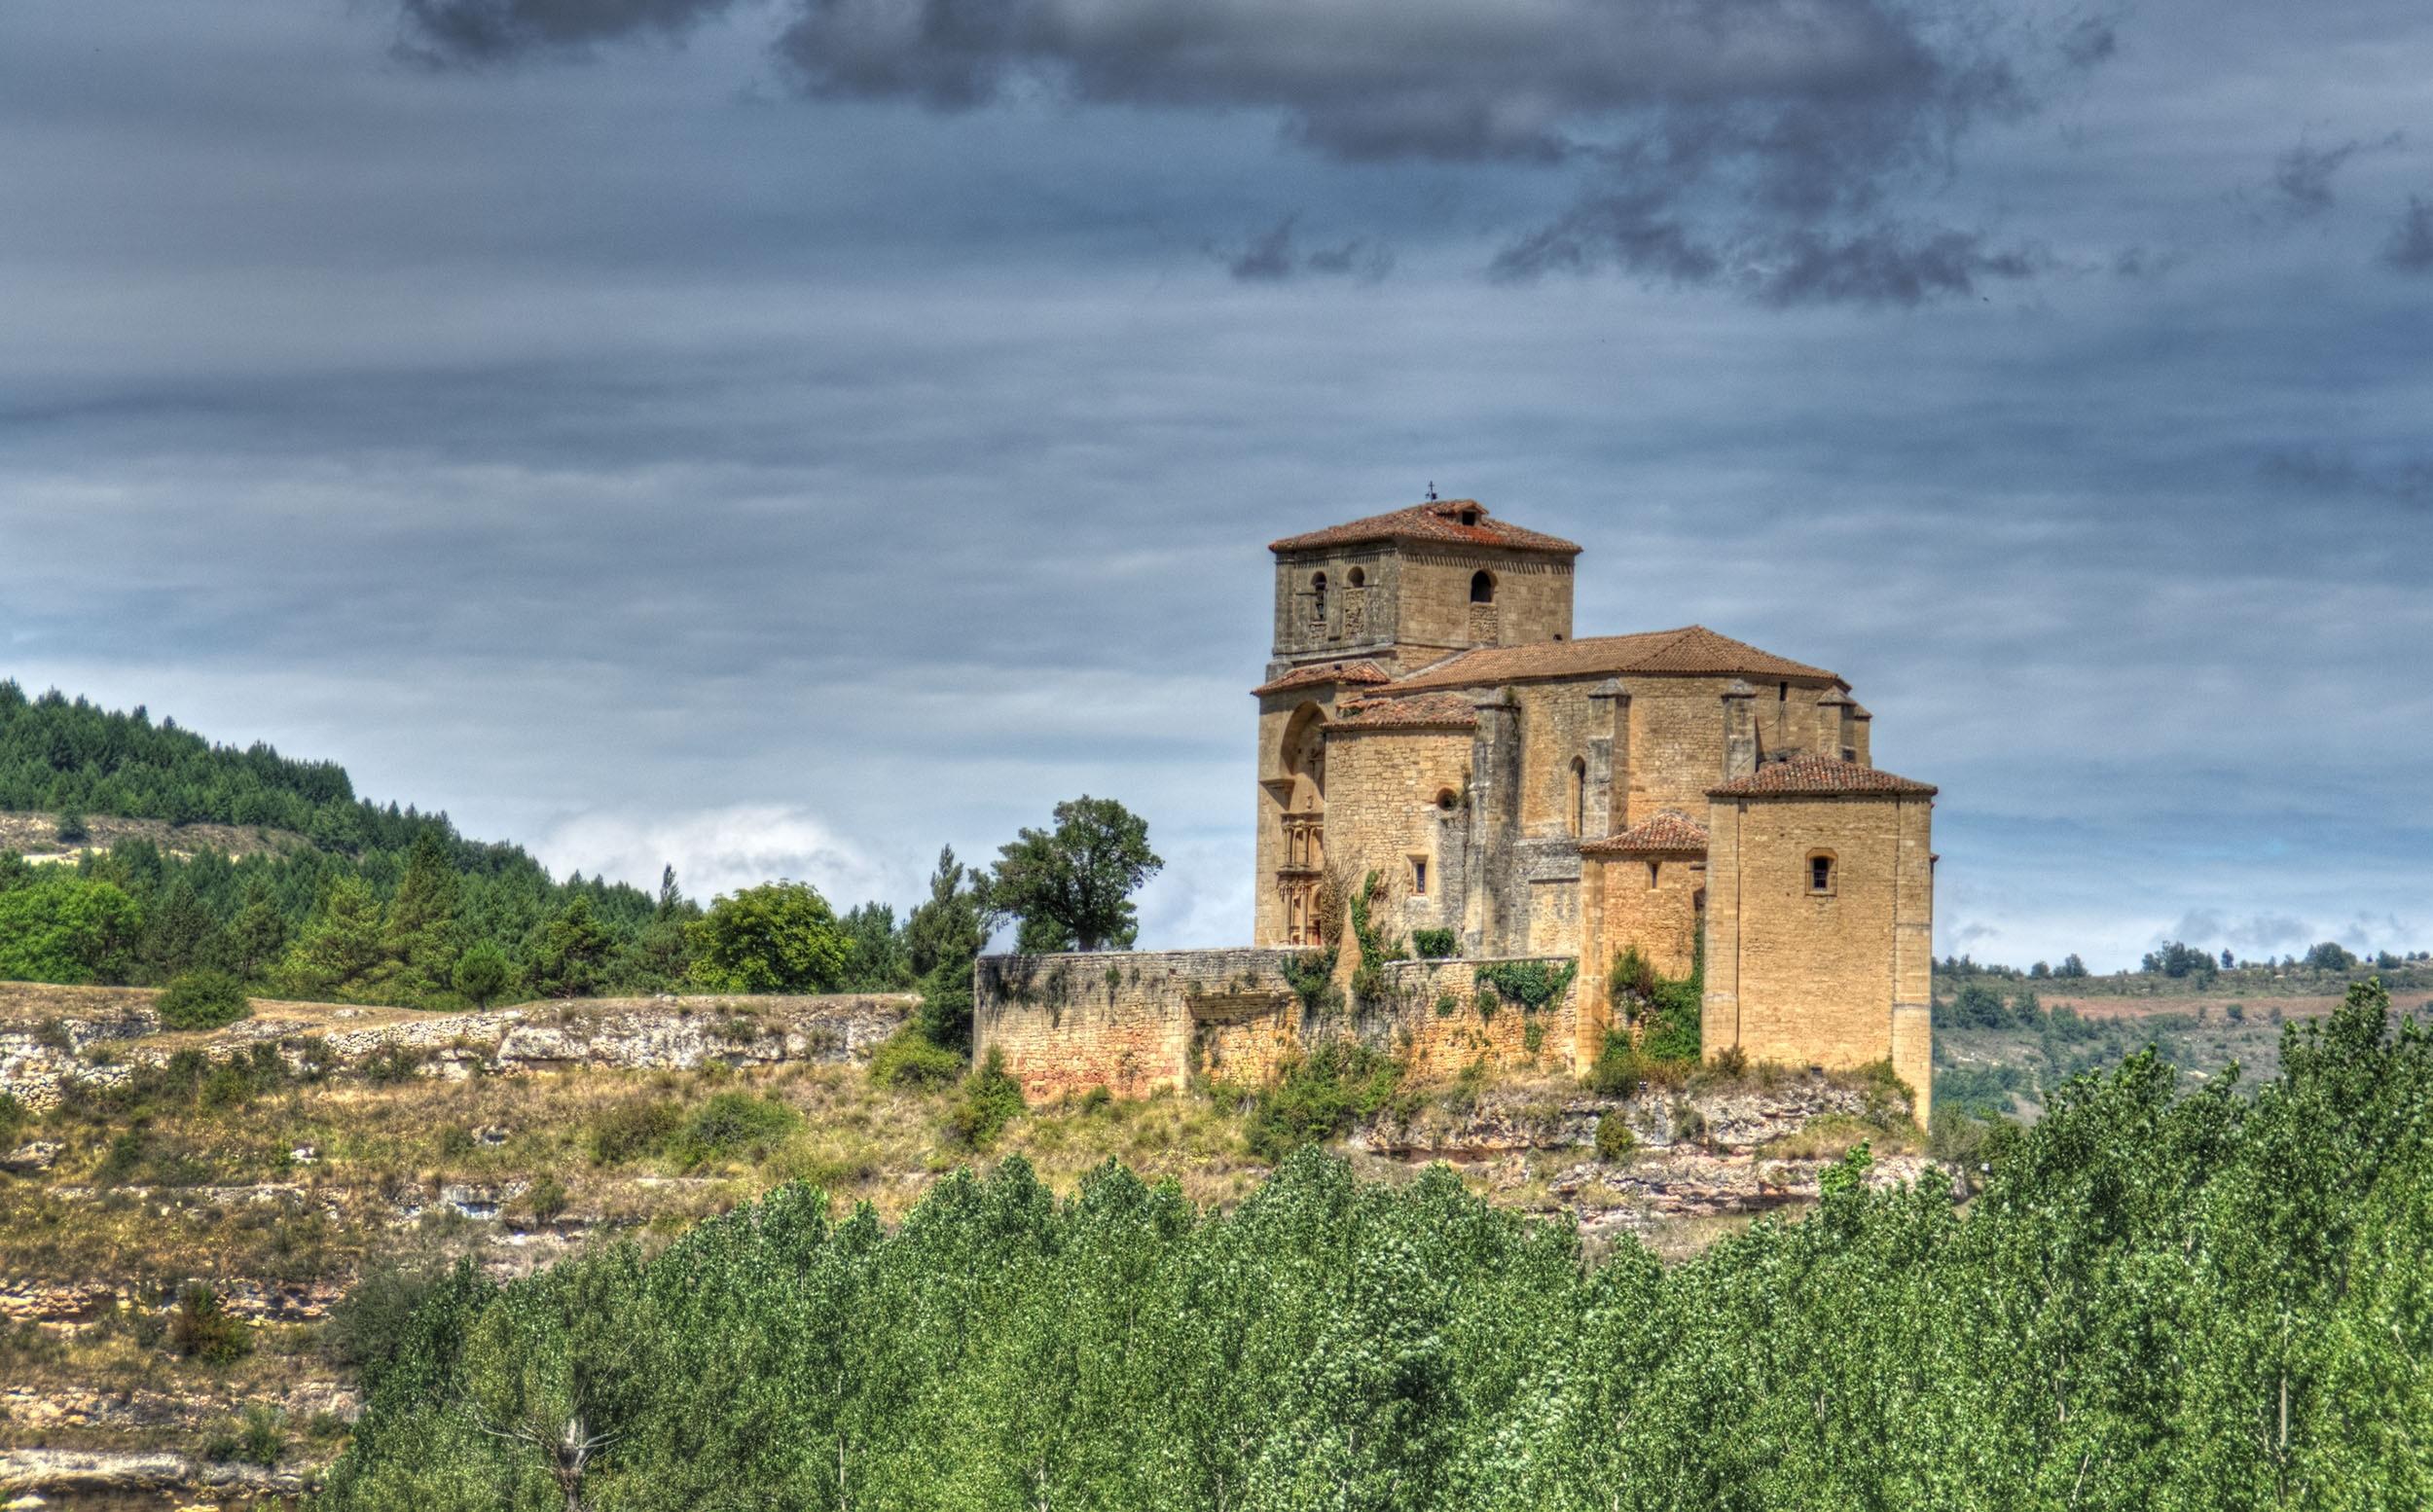 Valle de Sedano, Castile and Leon, Spain